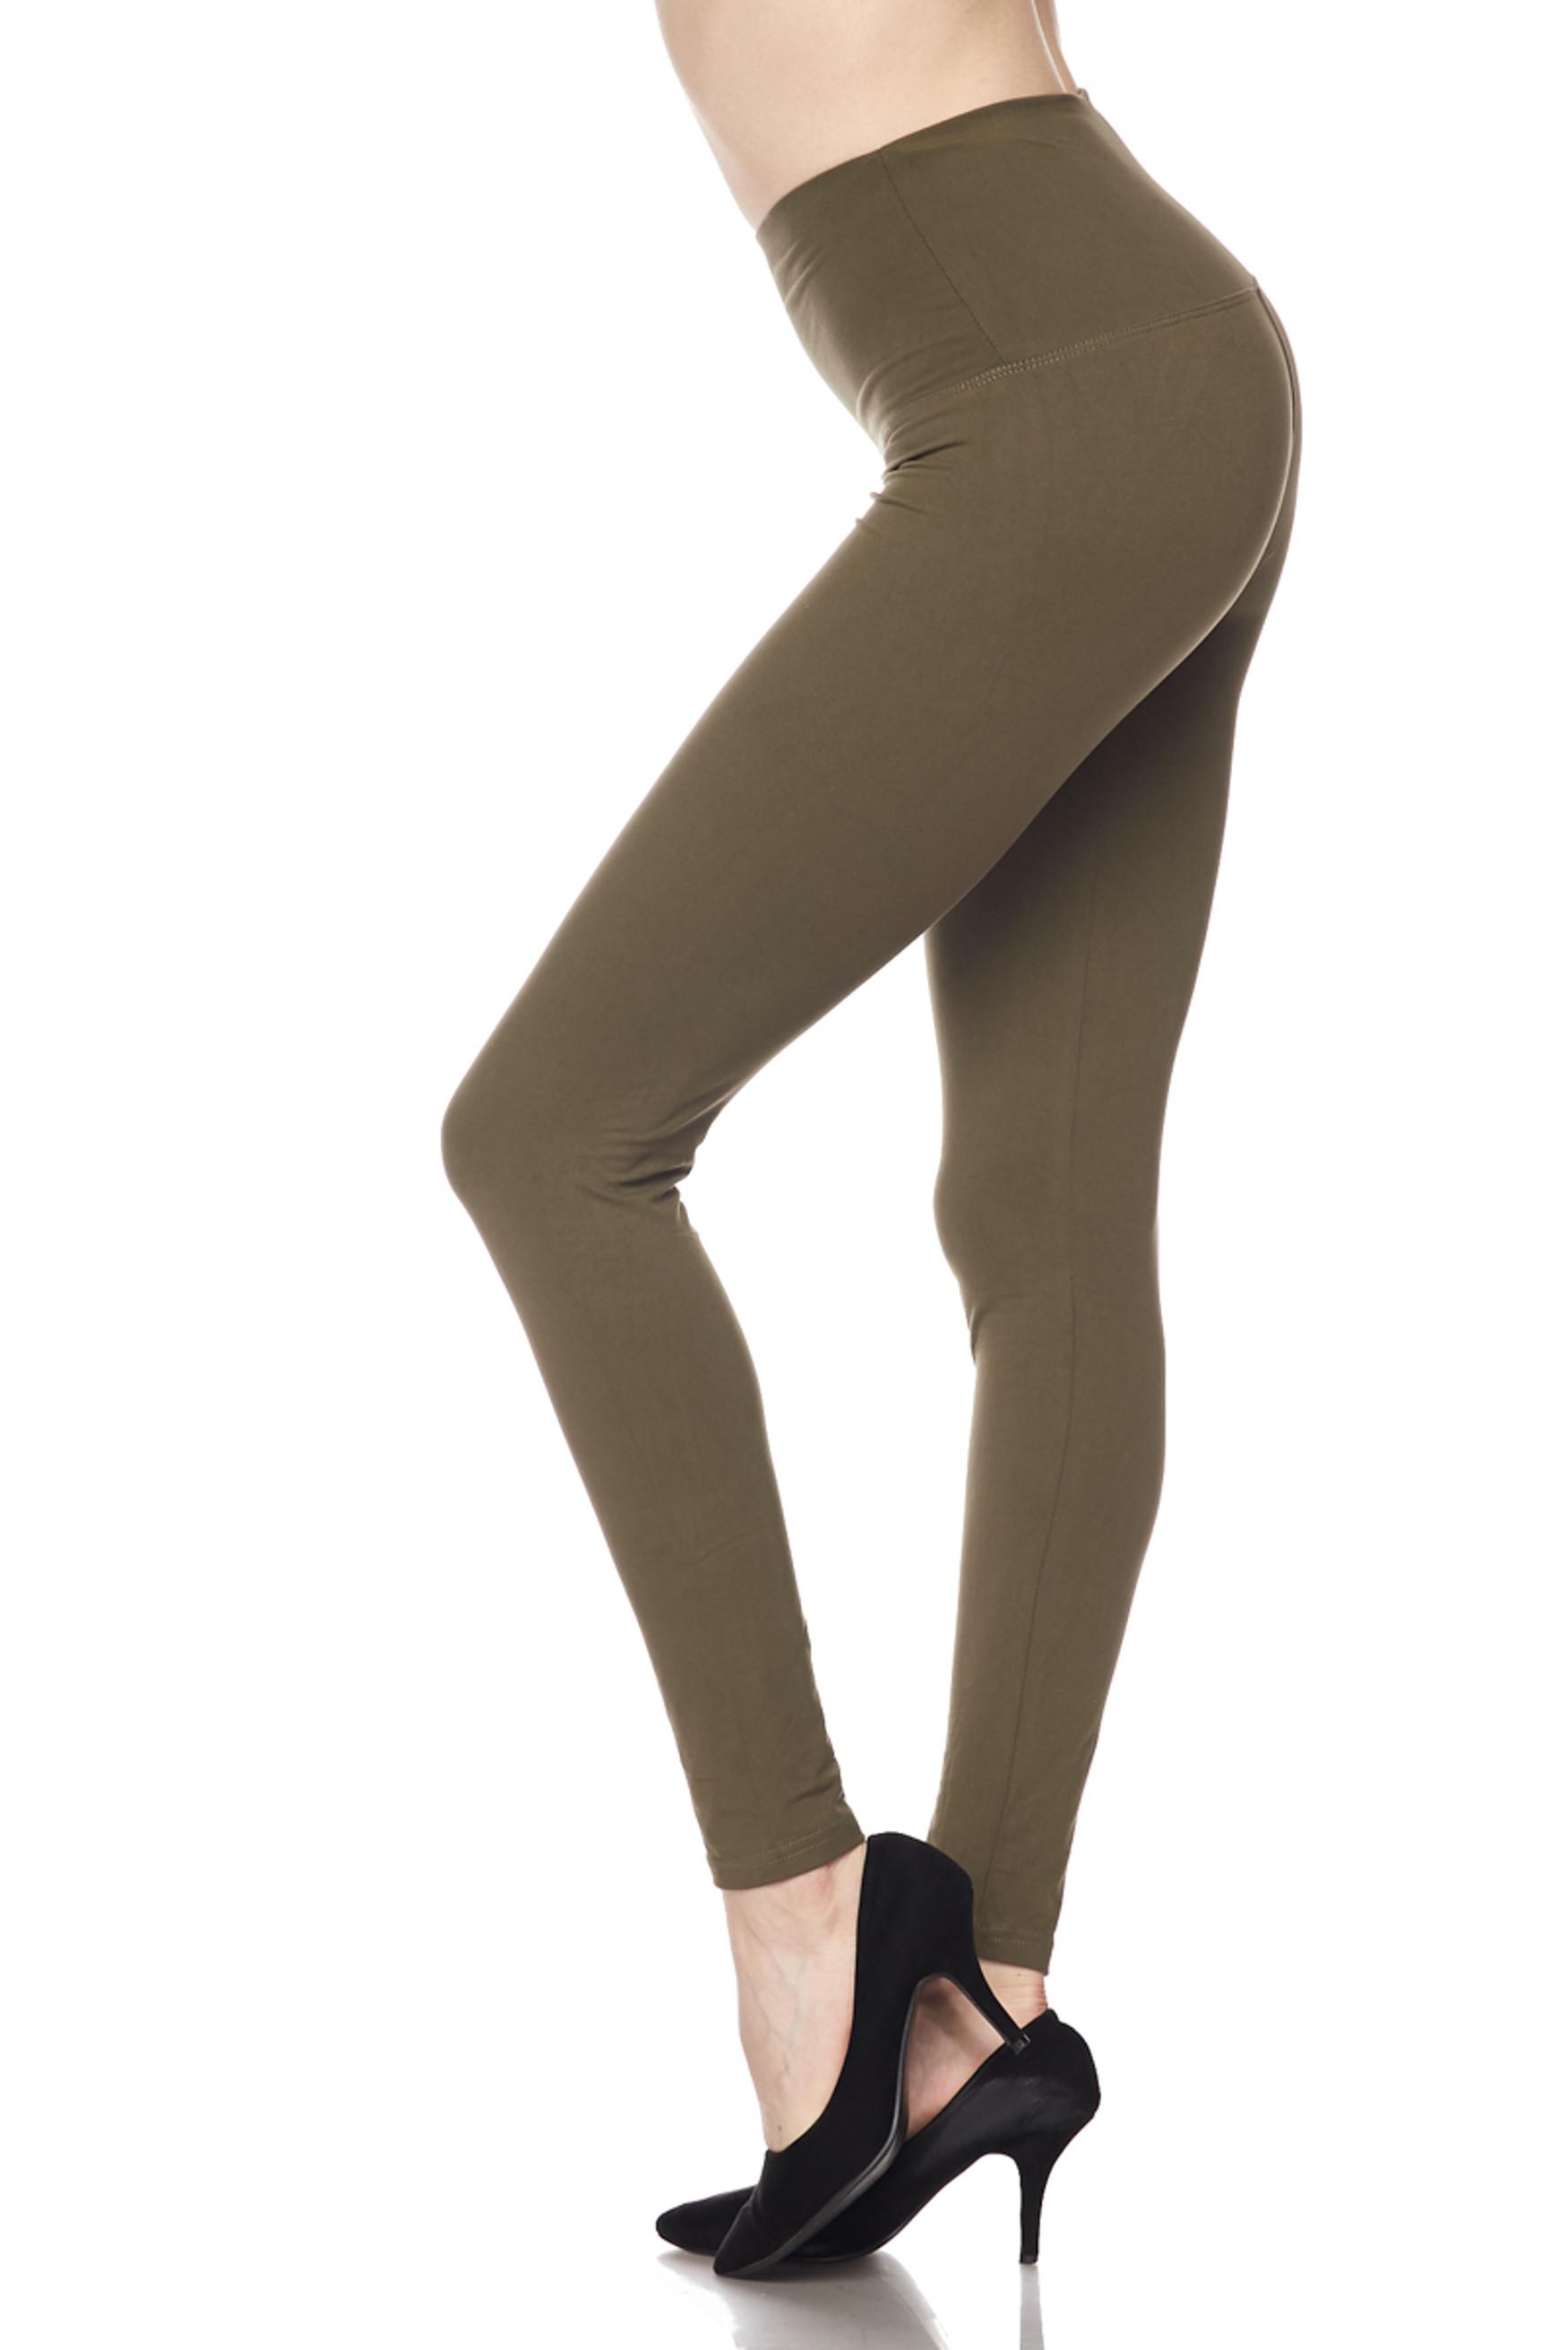 Brushed High Waisted Basic Solid Plus Size Leggings - 5 Inch Waist